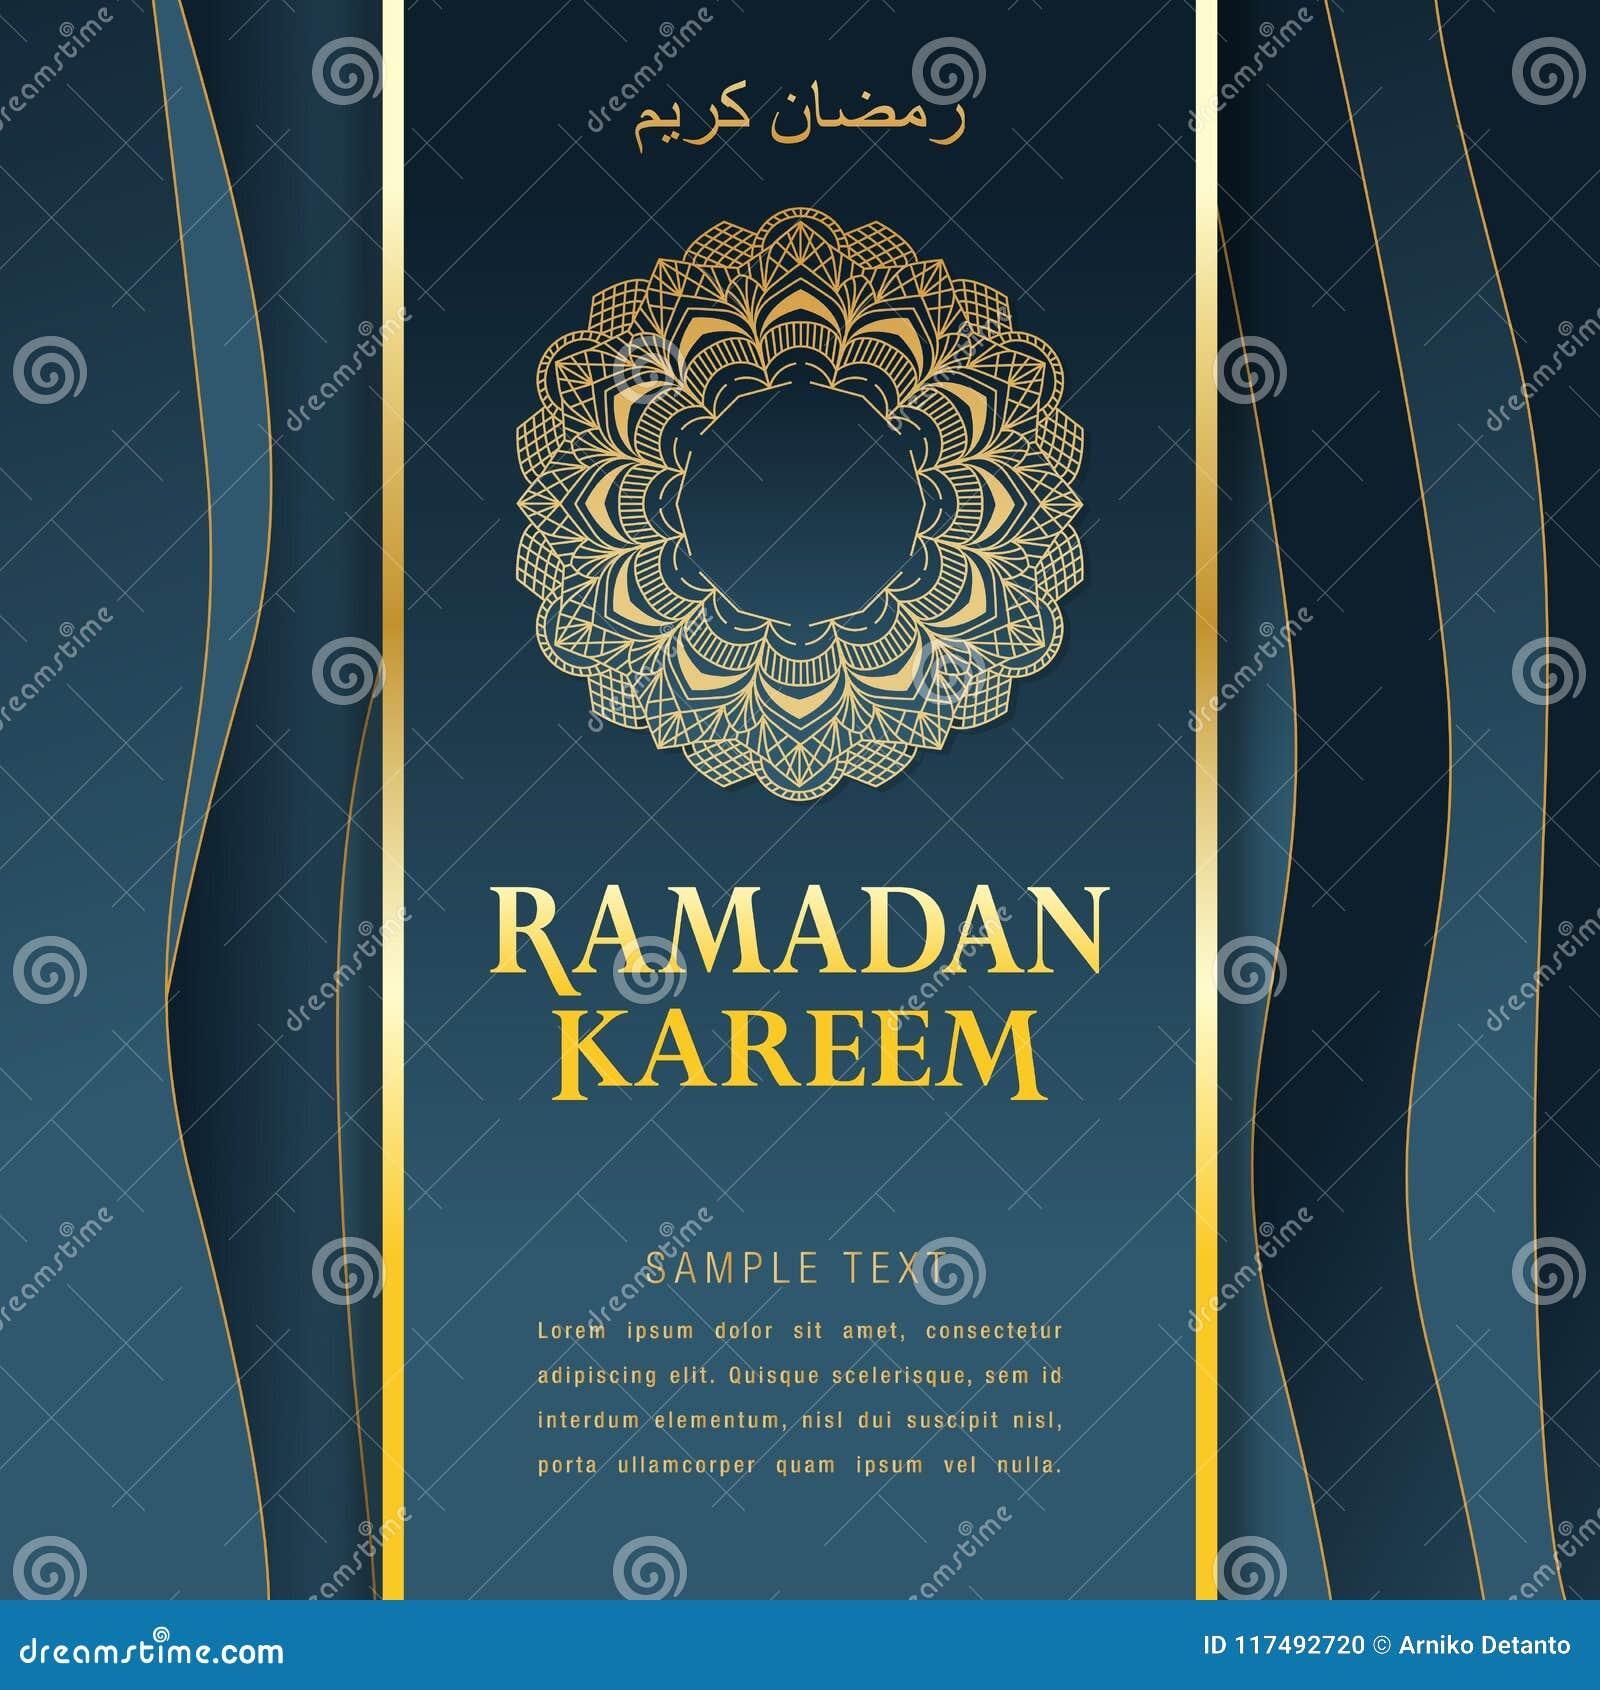 Download Illustration Of Ramadan KareRamadan Kareem Islamic Greeting Design With Arabic Pattern And Calligraphy. Ramadan